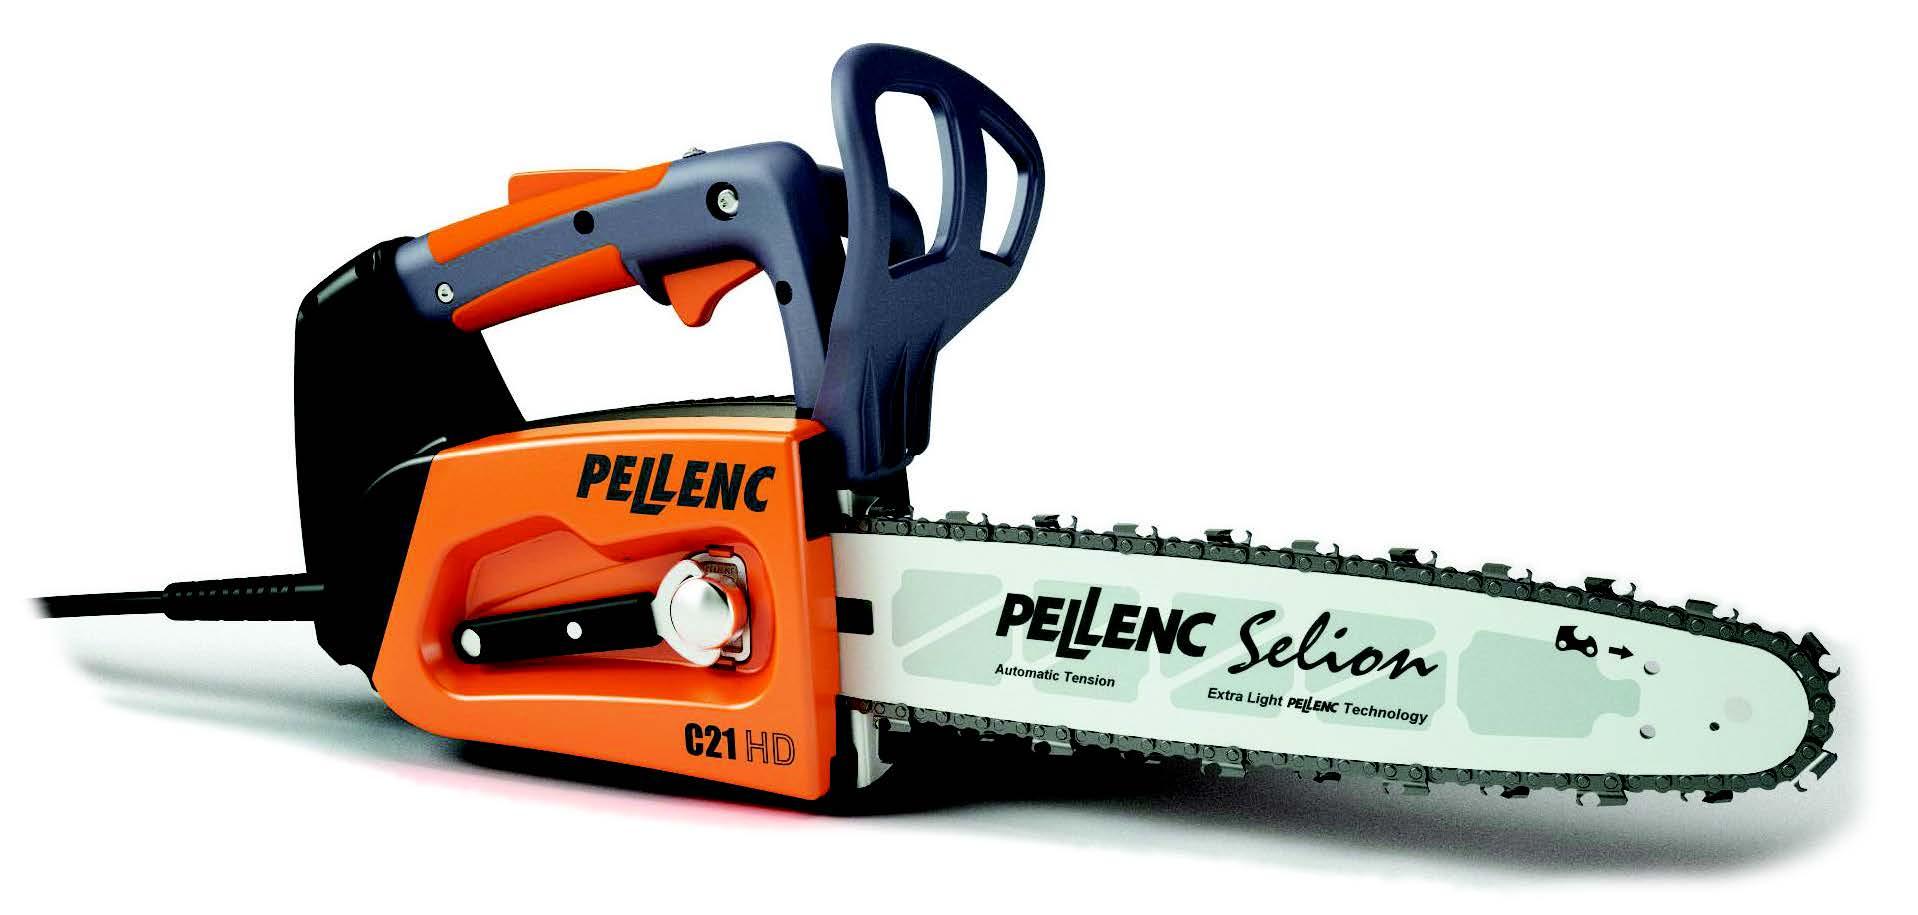 Pellenc Selion SEC21 Chainsaw Image